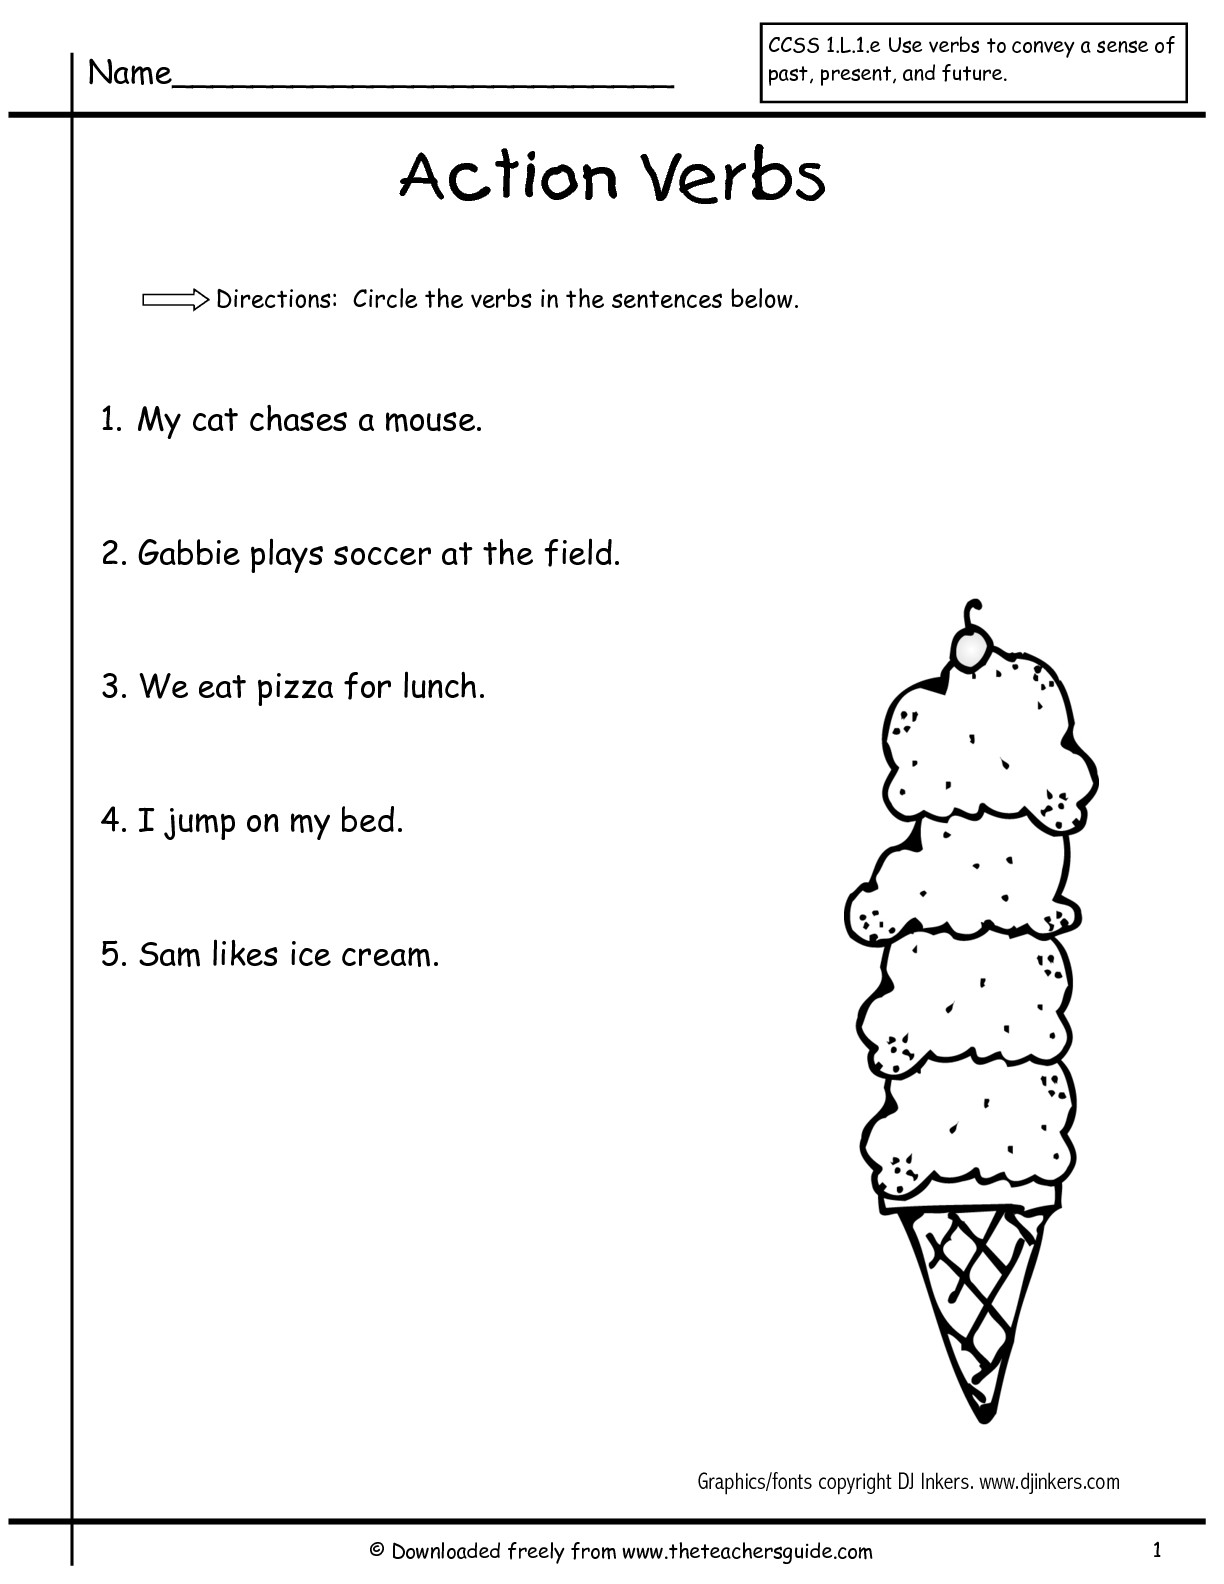 19 Best Images Of 1st Grade Grammar Worksheets Nouns And